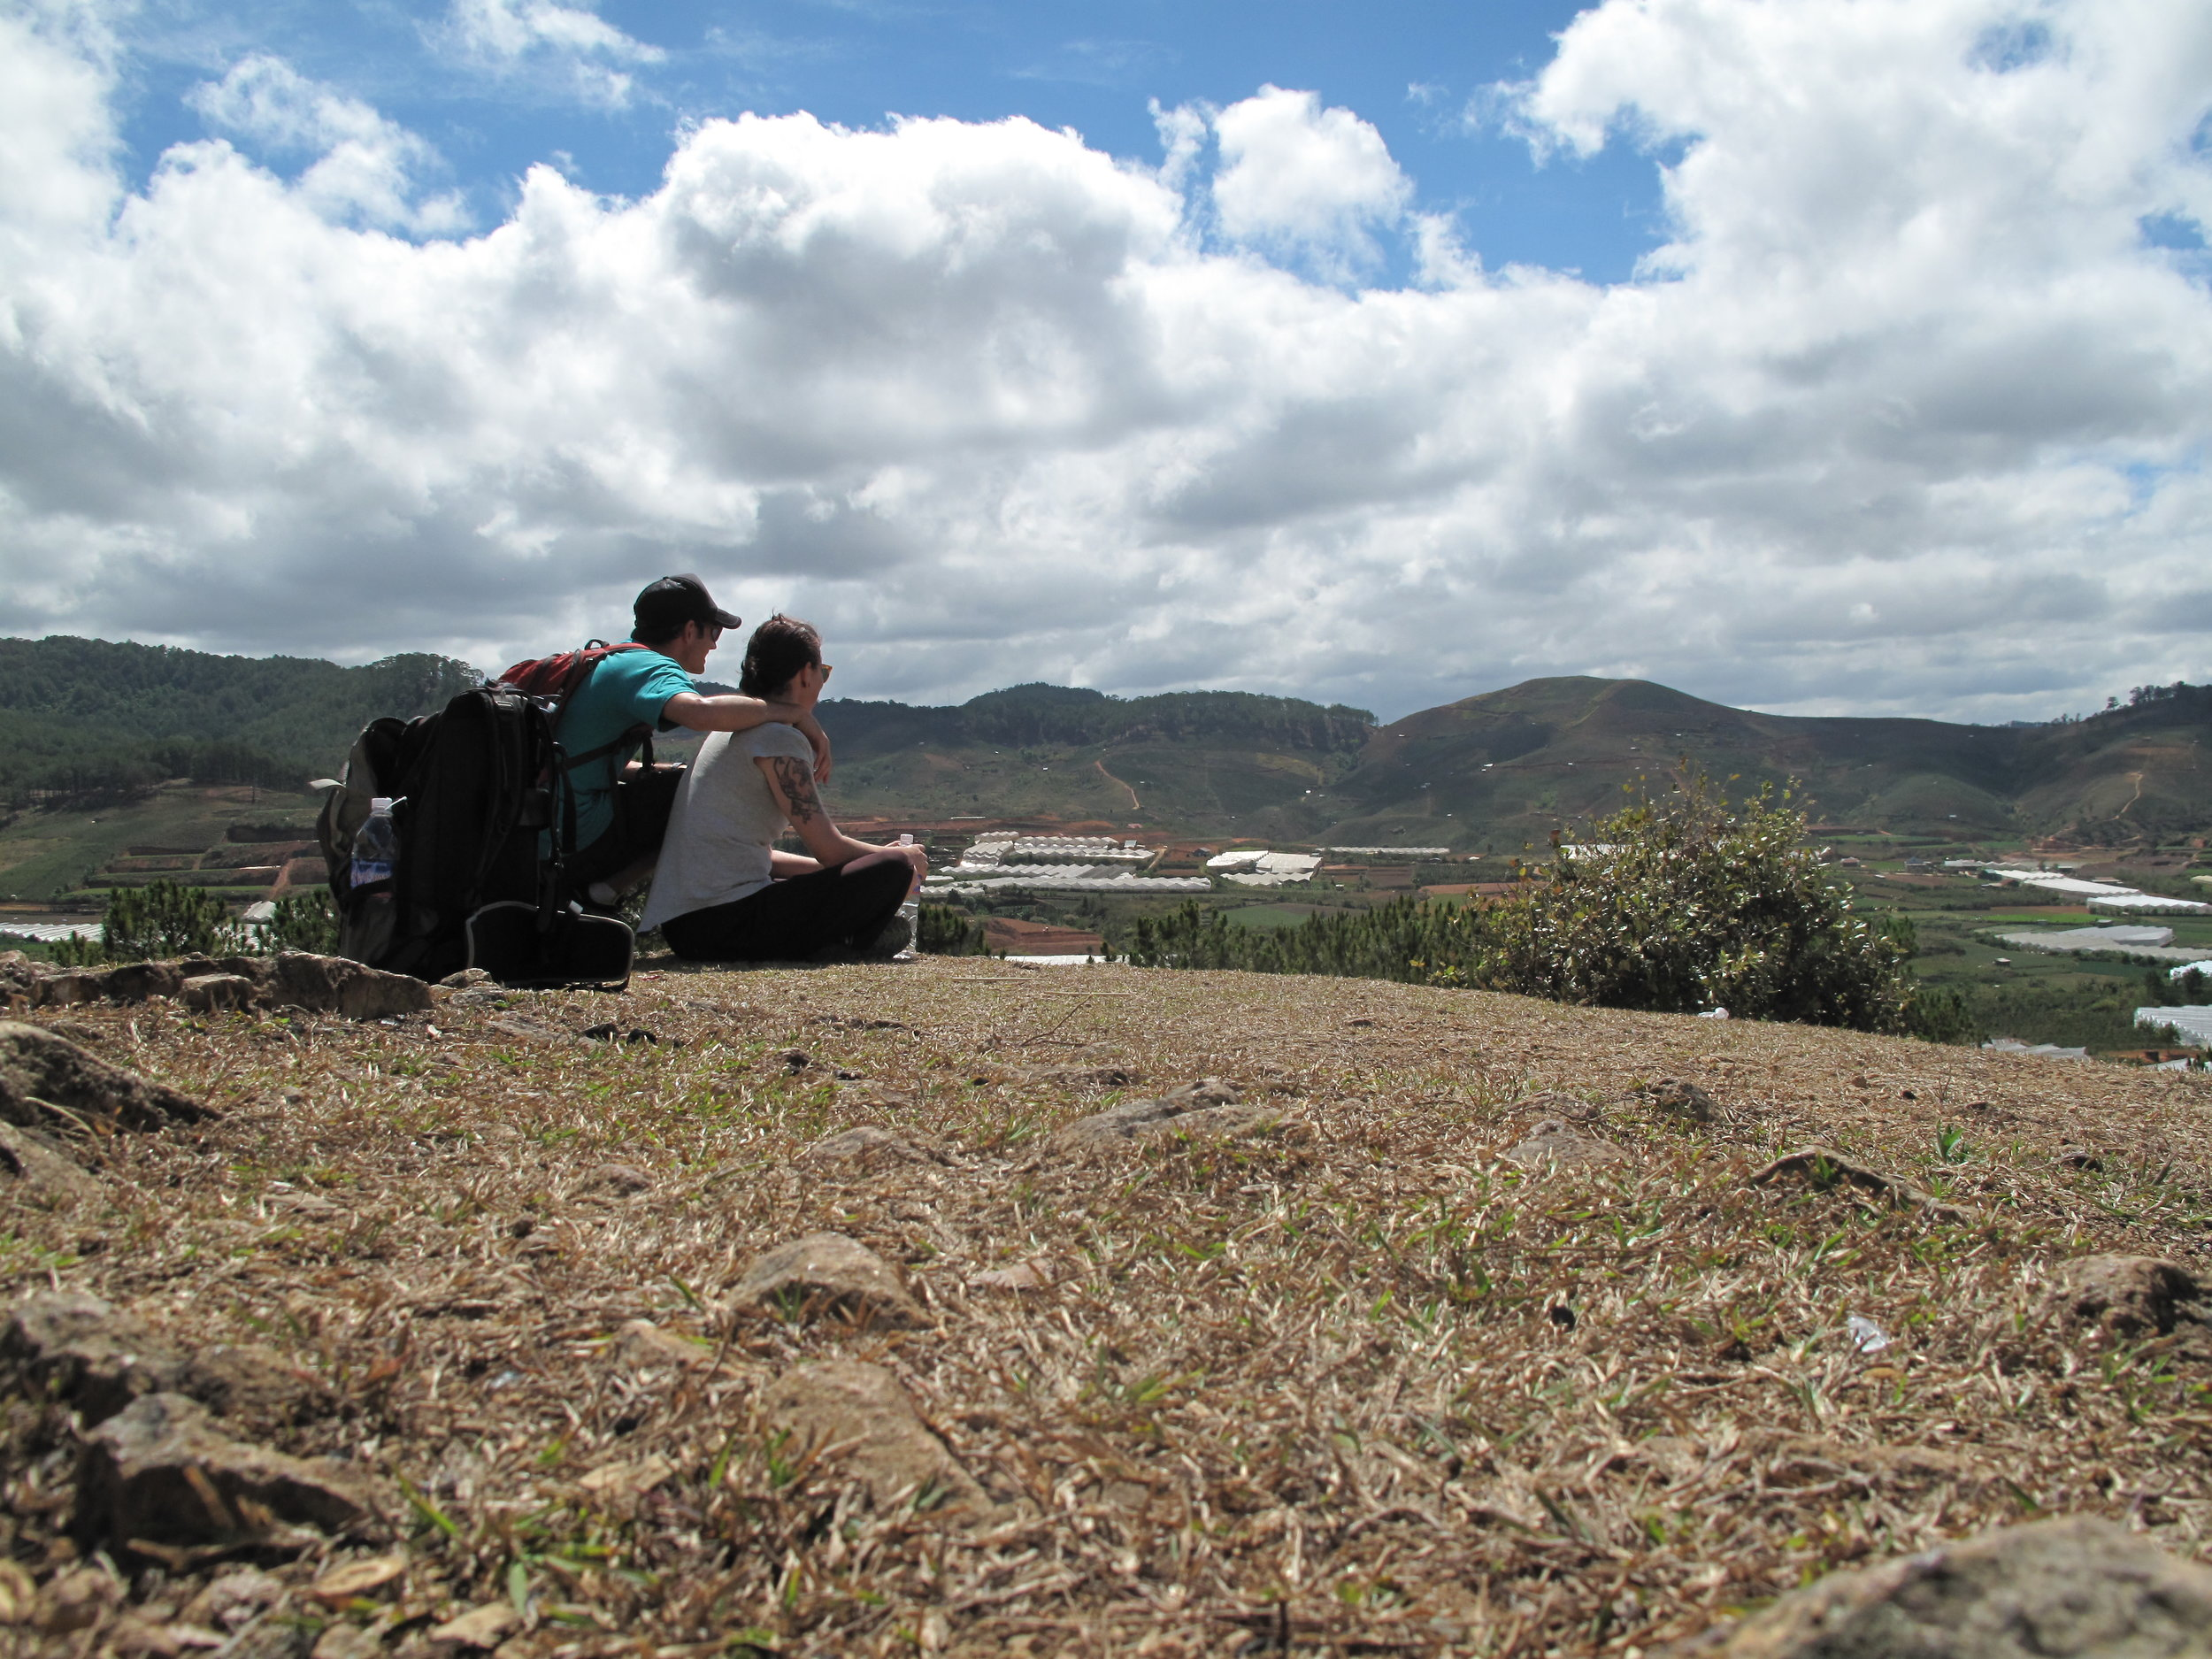 Three Peaks hike, Dalat